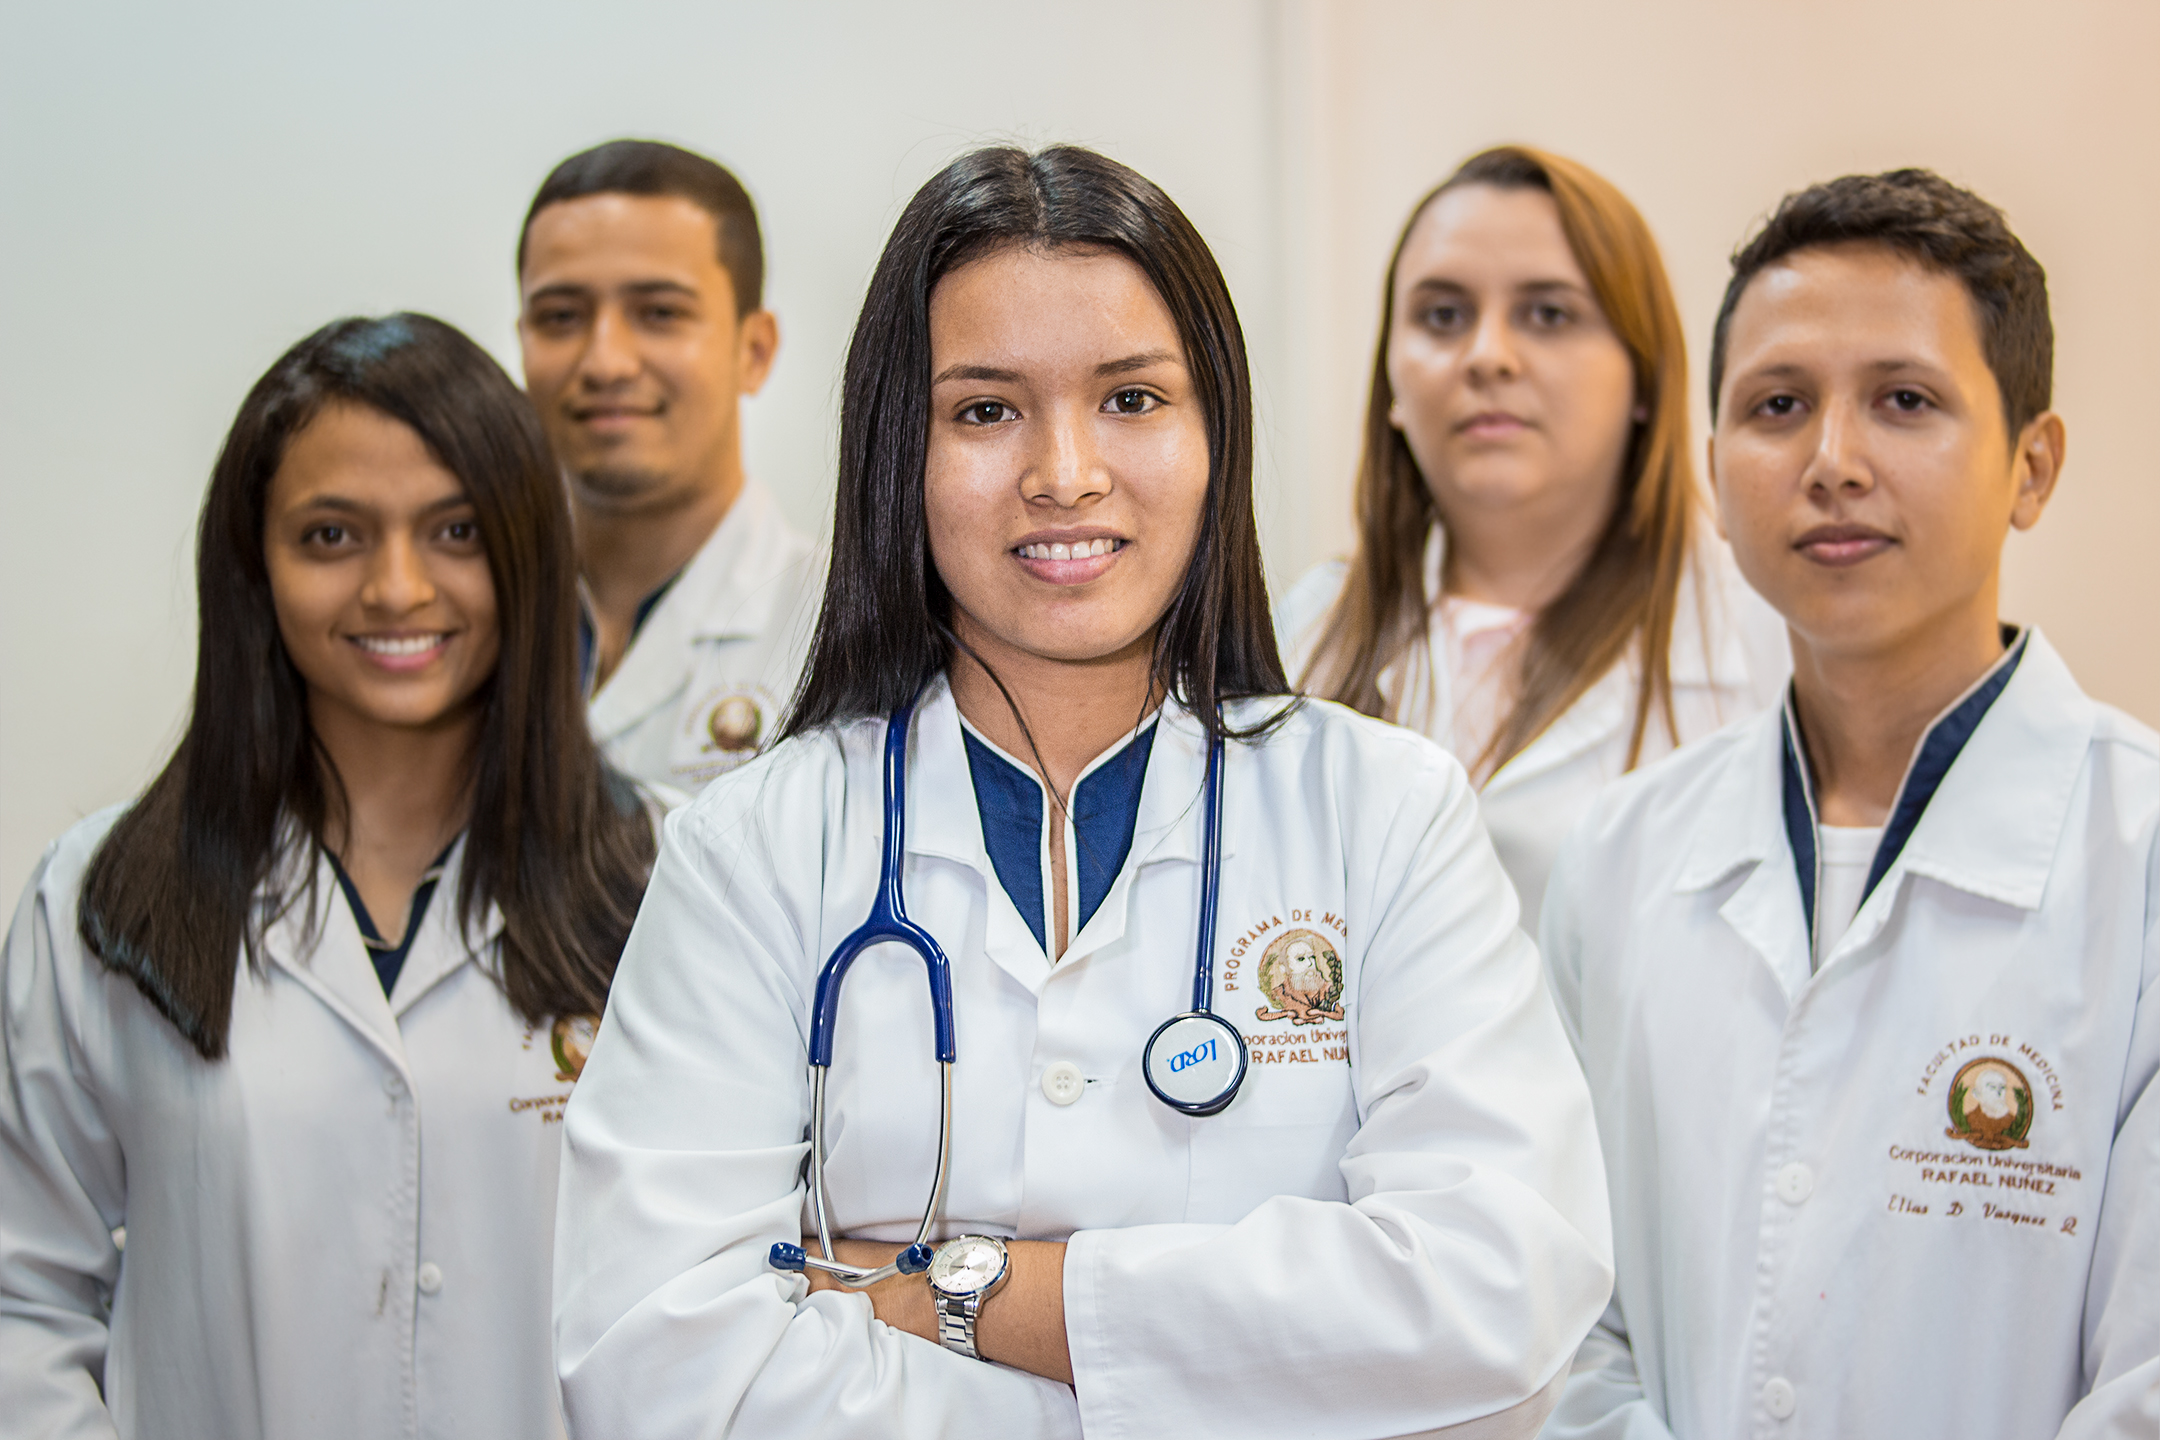 Lista de admitidos al Programa de Medicina para 2019-01